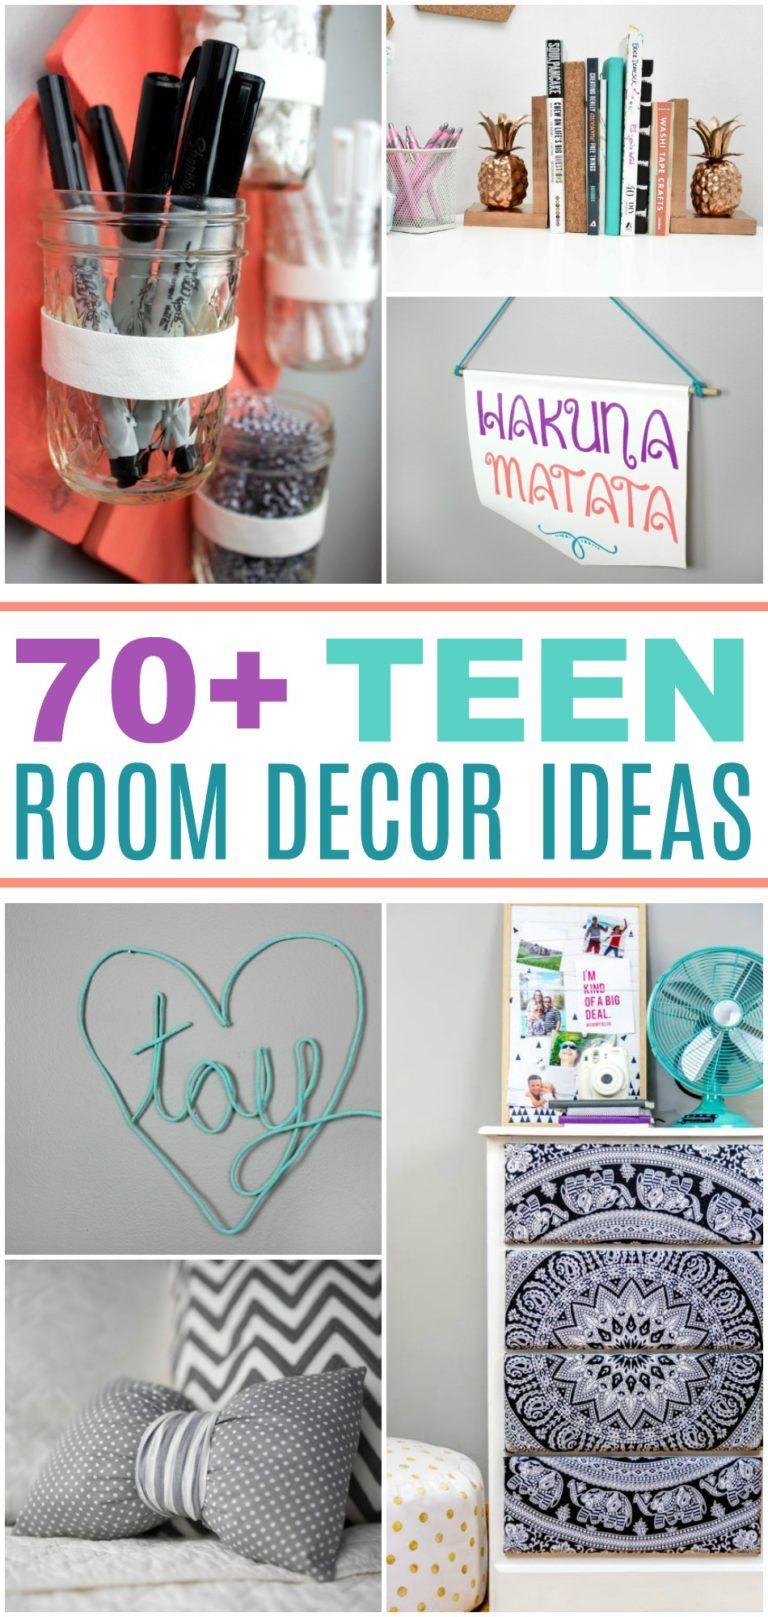 70 Diy Room Decor Ideas For Teens Diy Room Decor For Teens Diy Girls Bedroom Easy Diy Room Decor